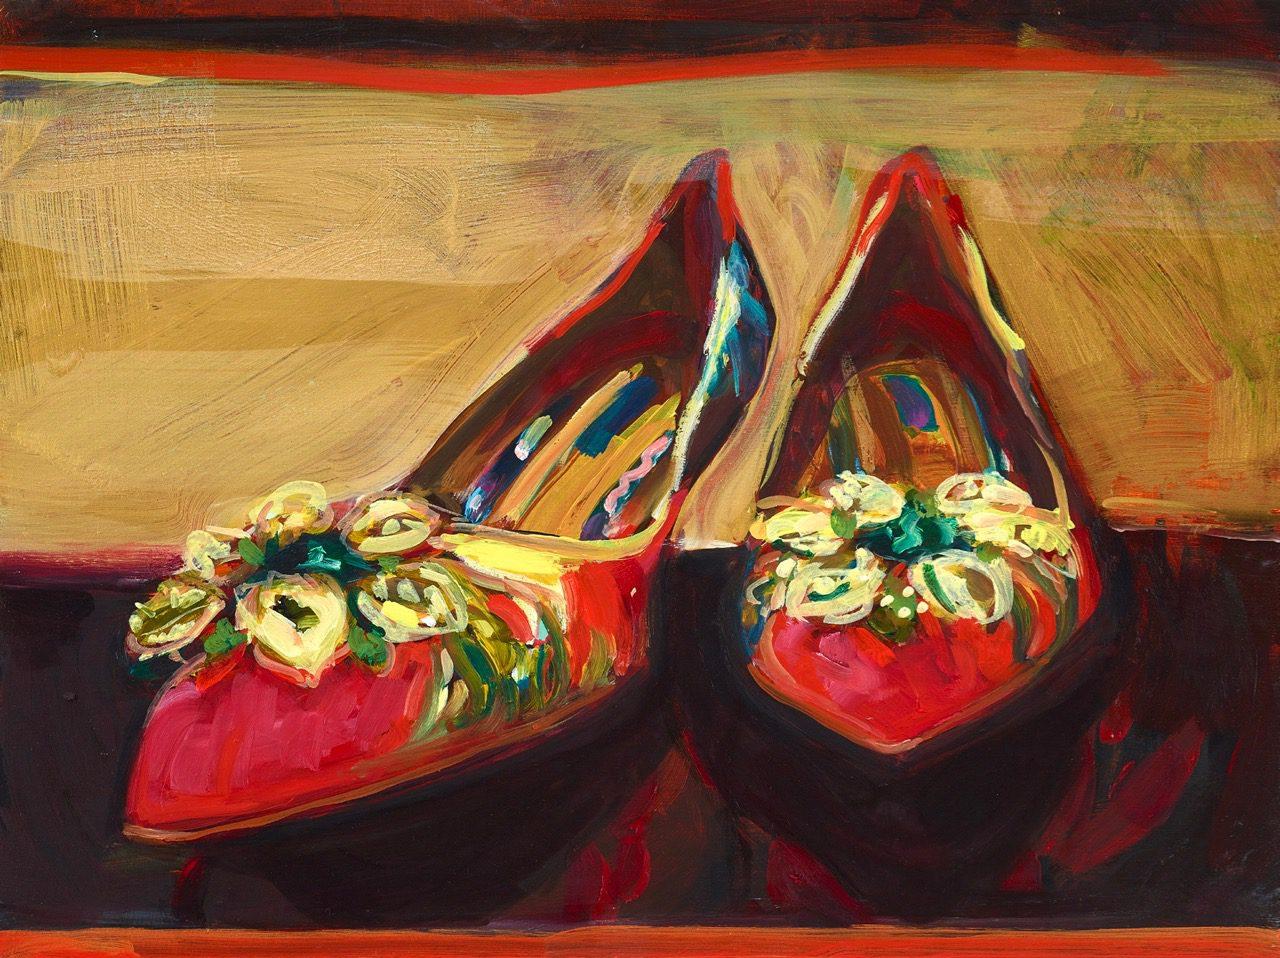 Killing me softly, Dolce &Gabbana, 2018, Öl und Gold auf Holz, 30 x 40 cm